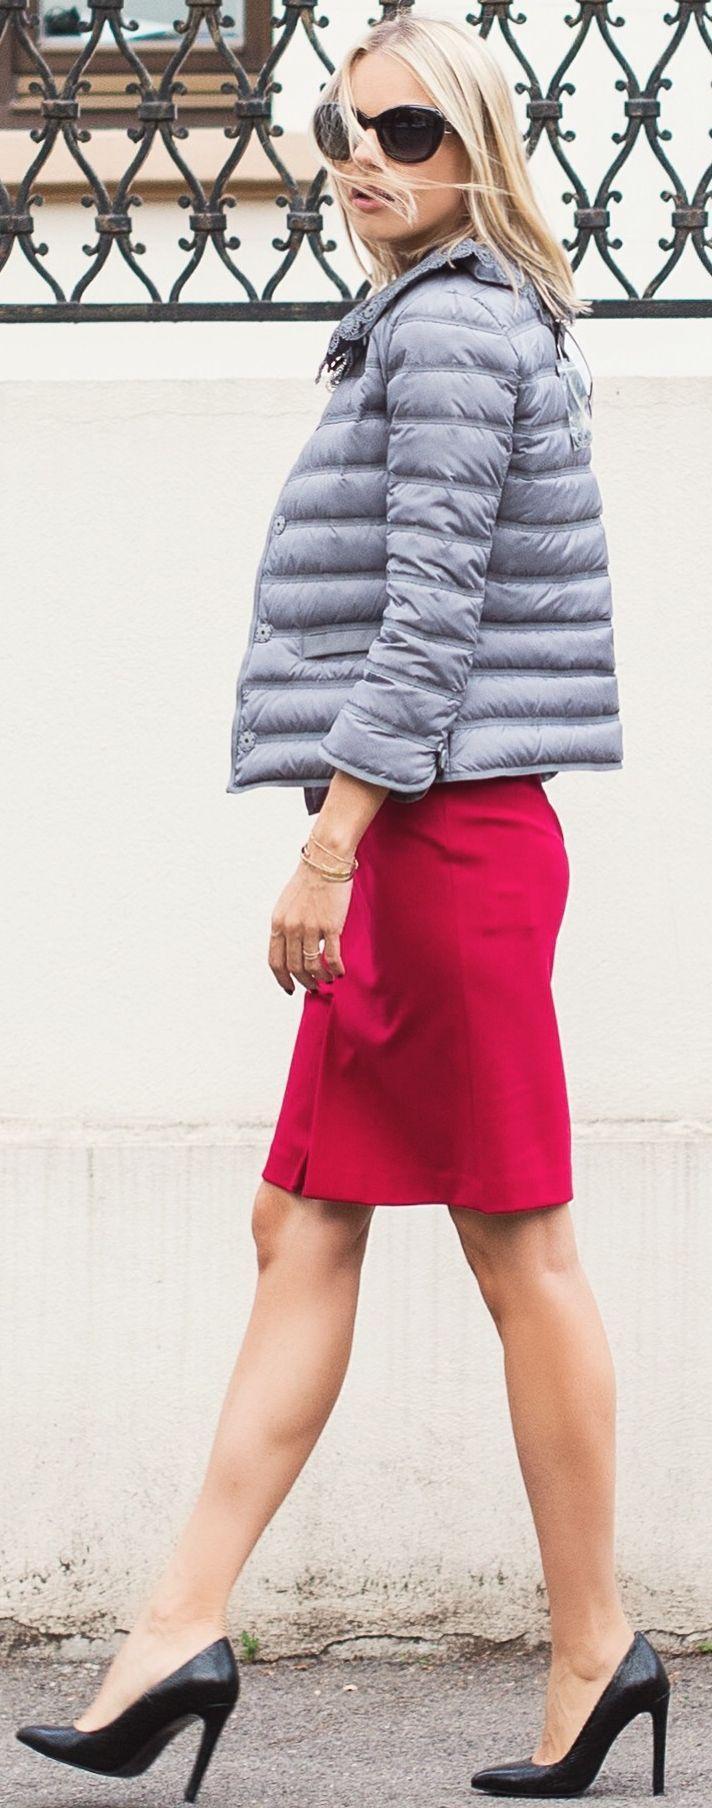 Catalina Grama Black Heels Red Skirt Grey Lace Collar Puffer Jacket Fall Inspo